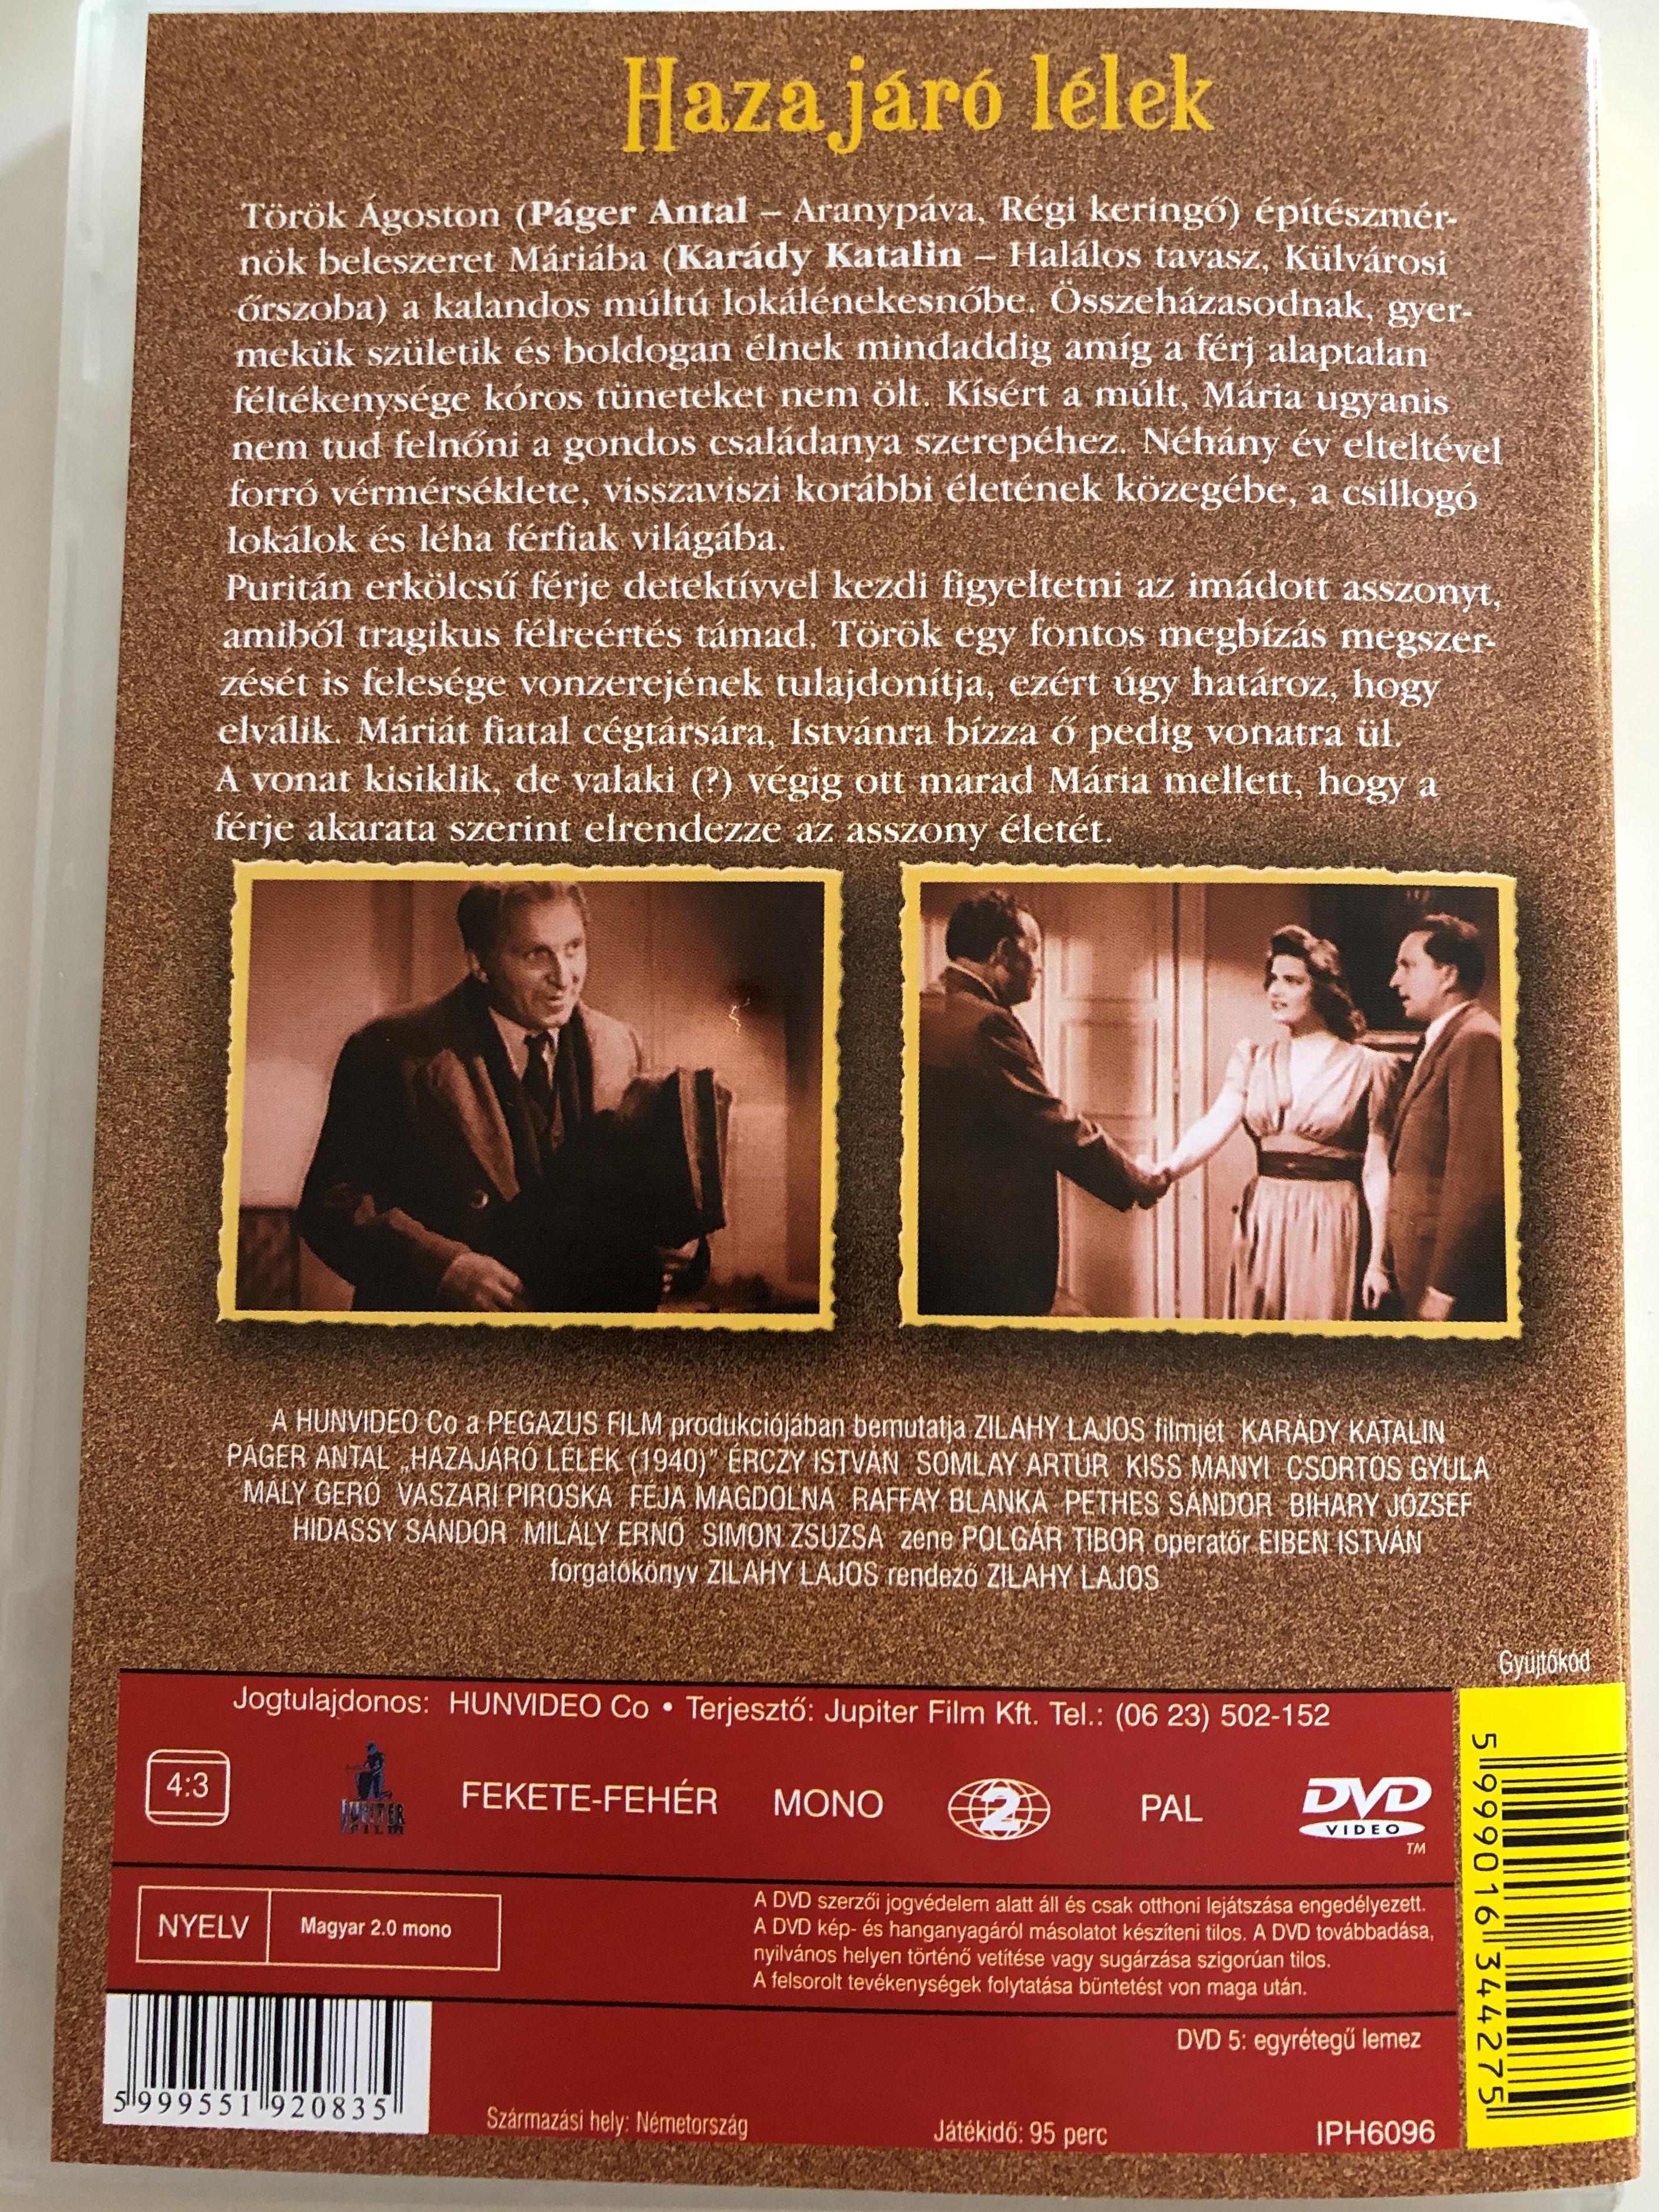 hazaj-r-l-lek-dvd-1940-directed-by-zilahy-lajos-starring-kar-dy-katalin-p-ger-antal-kiss-manyi-hungarian-b-w-classic-film-magyar-klasszikusok-28.-2-.jpg